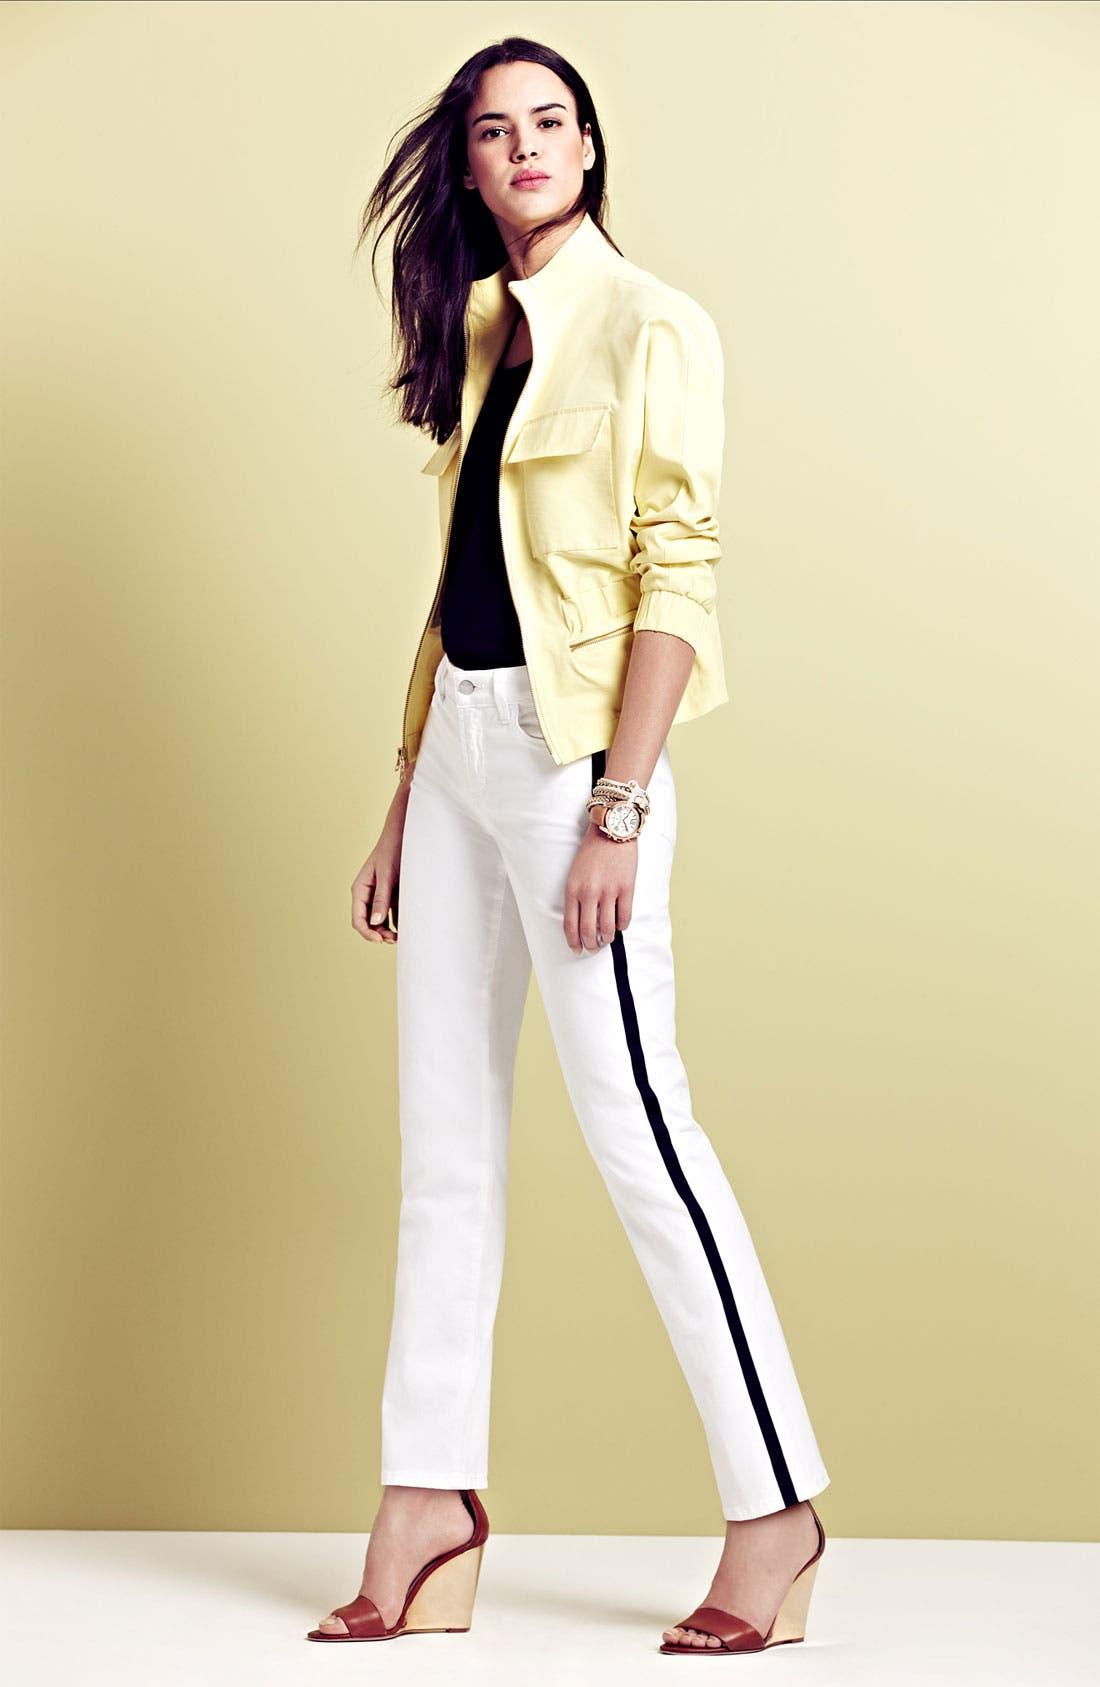 Main Image - NYDJ 'Sheri' Tuxedo Jeans & Top, Isaac Mizrahi New York Anorak